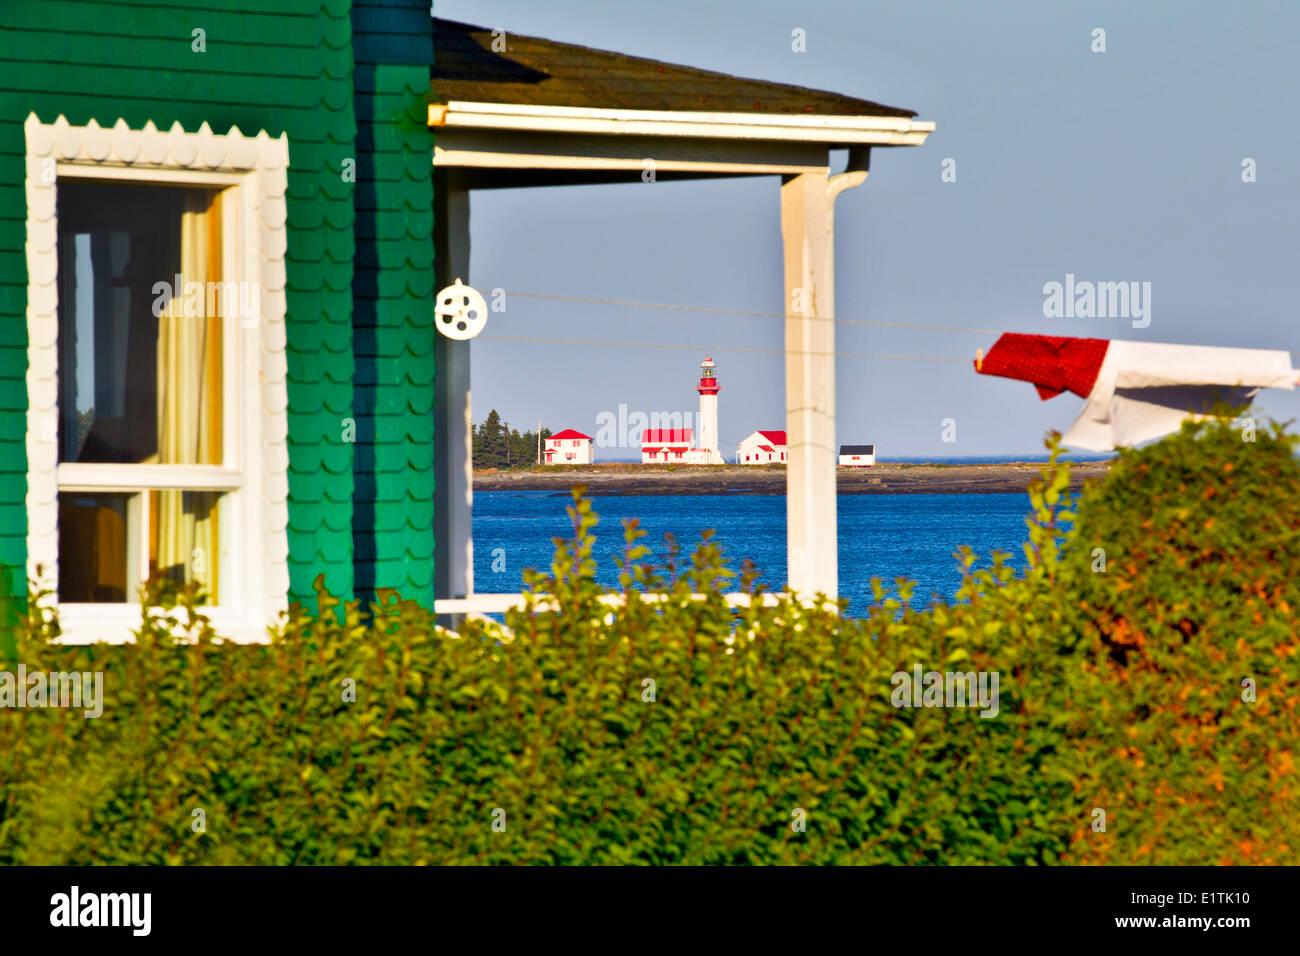 Lighthouse and Clothesline, Métis-sur-Mer, Québec, Quebec, Canada - Stock Image